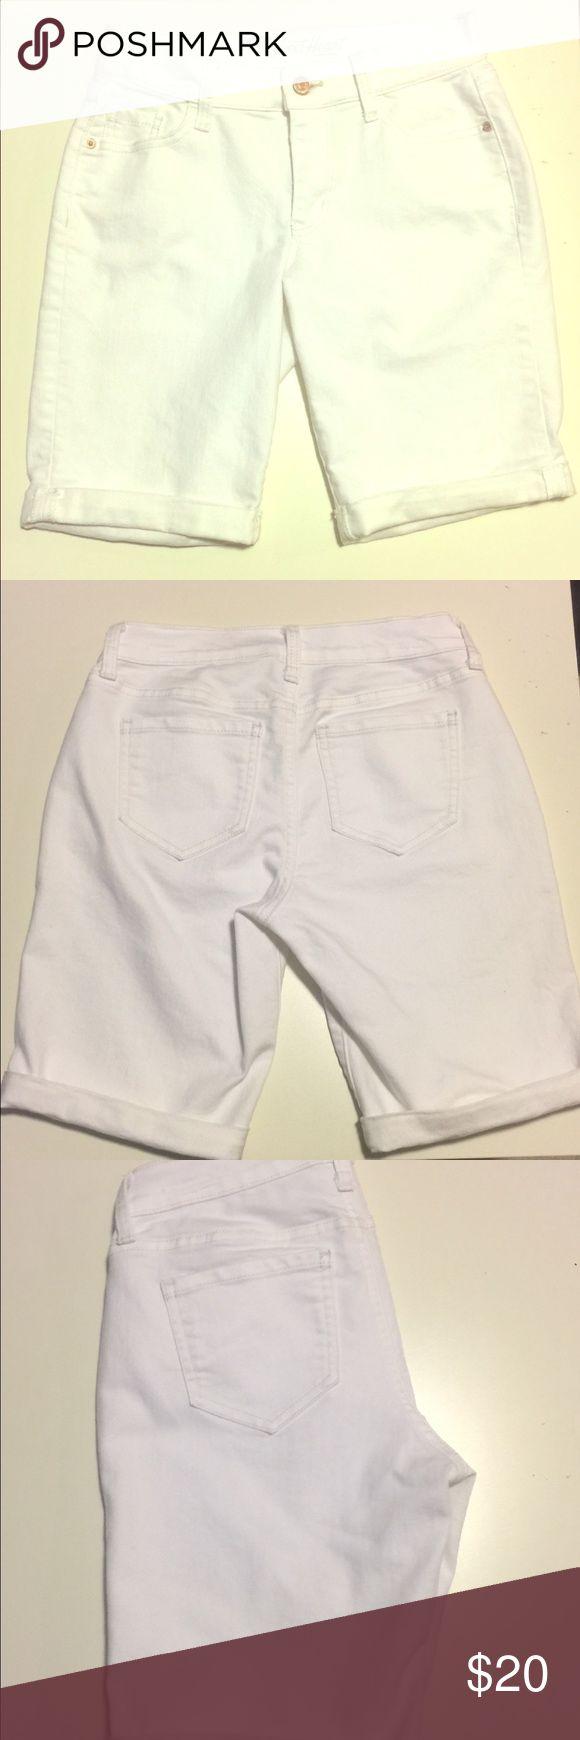 Old Navy Women's White Bermuda Shorts Size 0 Clean White Bermuda Shorts in size regular 0, denim Old Navy Shorts Bermudas